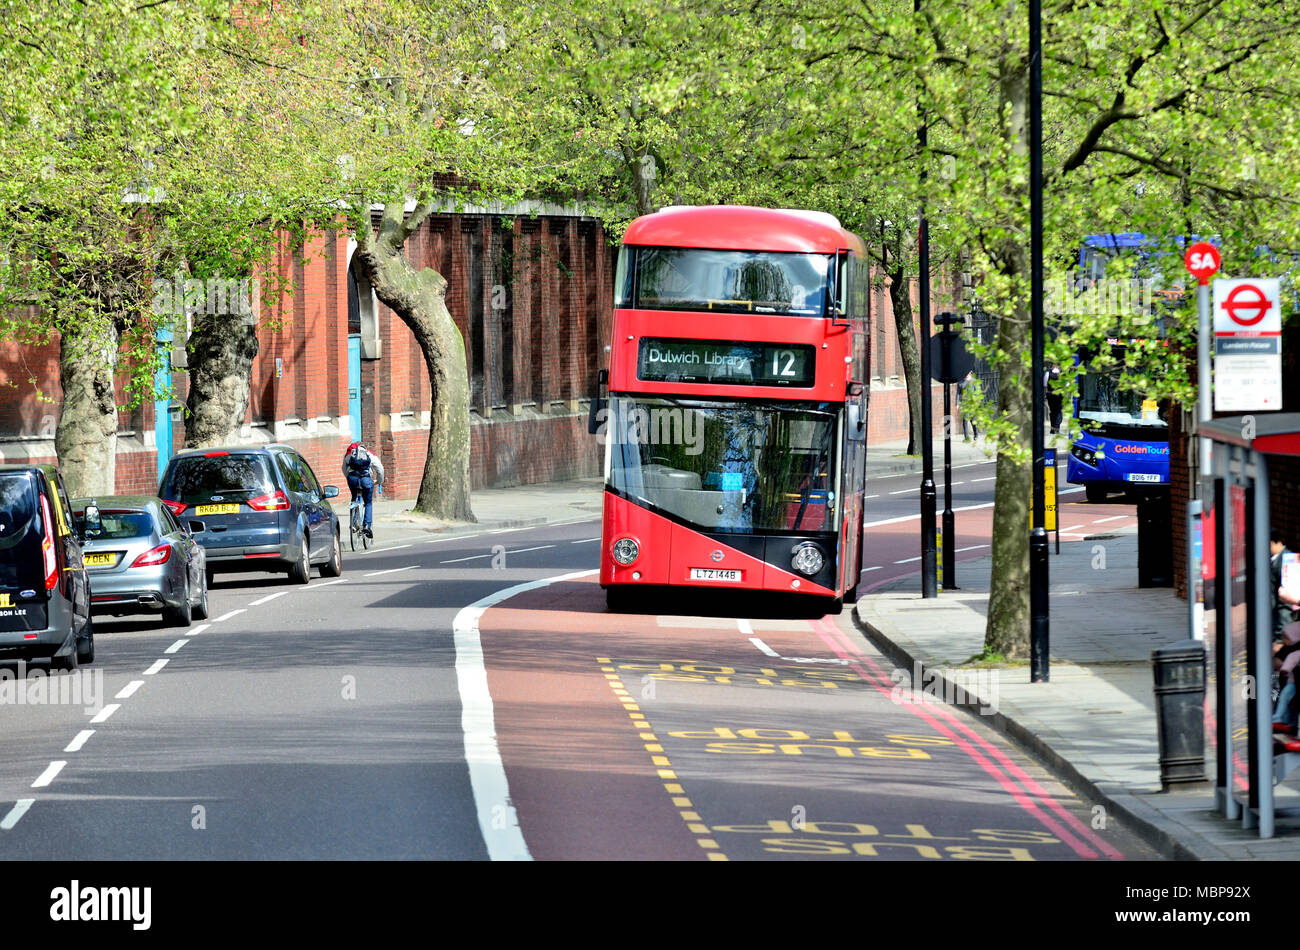 London, England, UK. Red double decker London bus passing Lambeth Palace - Stock Image